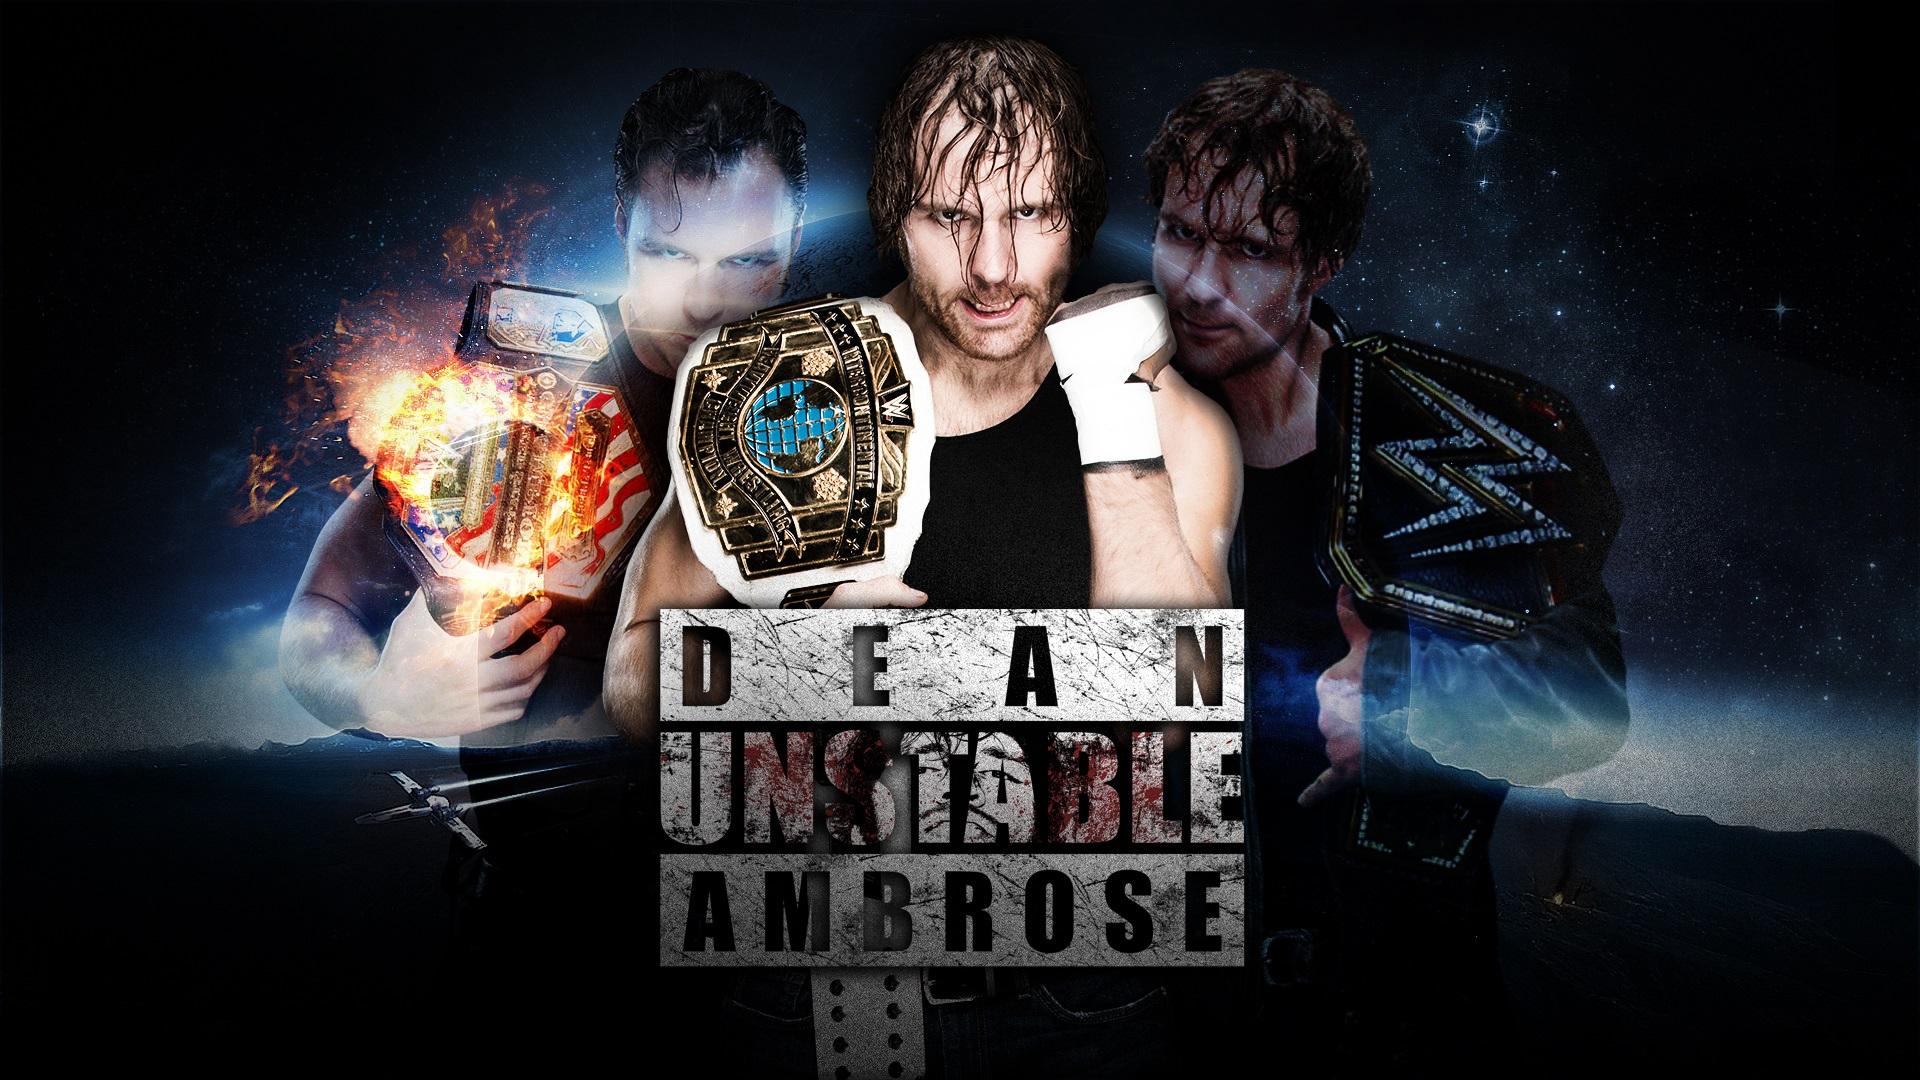 WWE Dean Ambrose Wallpaper HD Pictures One HD Wallpaper 1920x1080